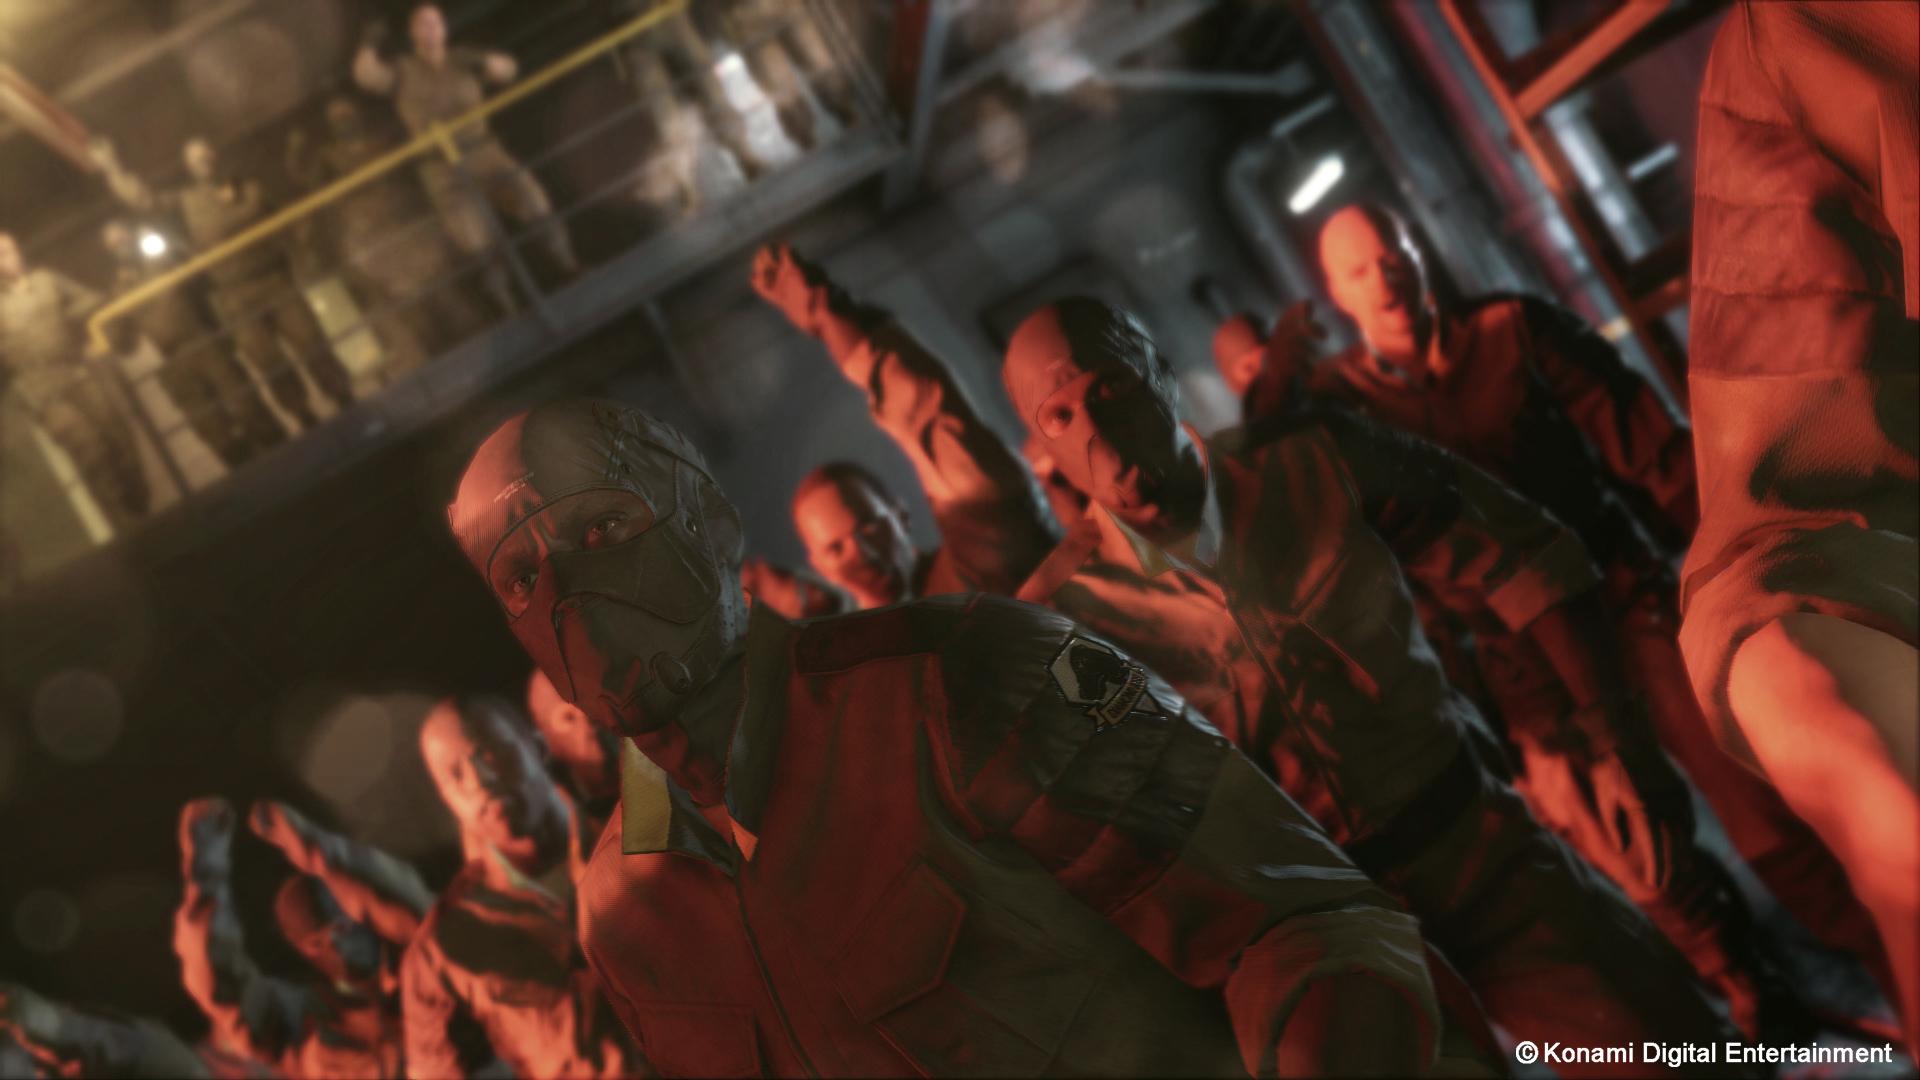 Metal-Gear-Solid-V-The-Phantom-Pain_2014_06-09-14_001